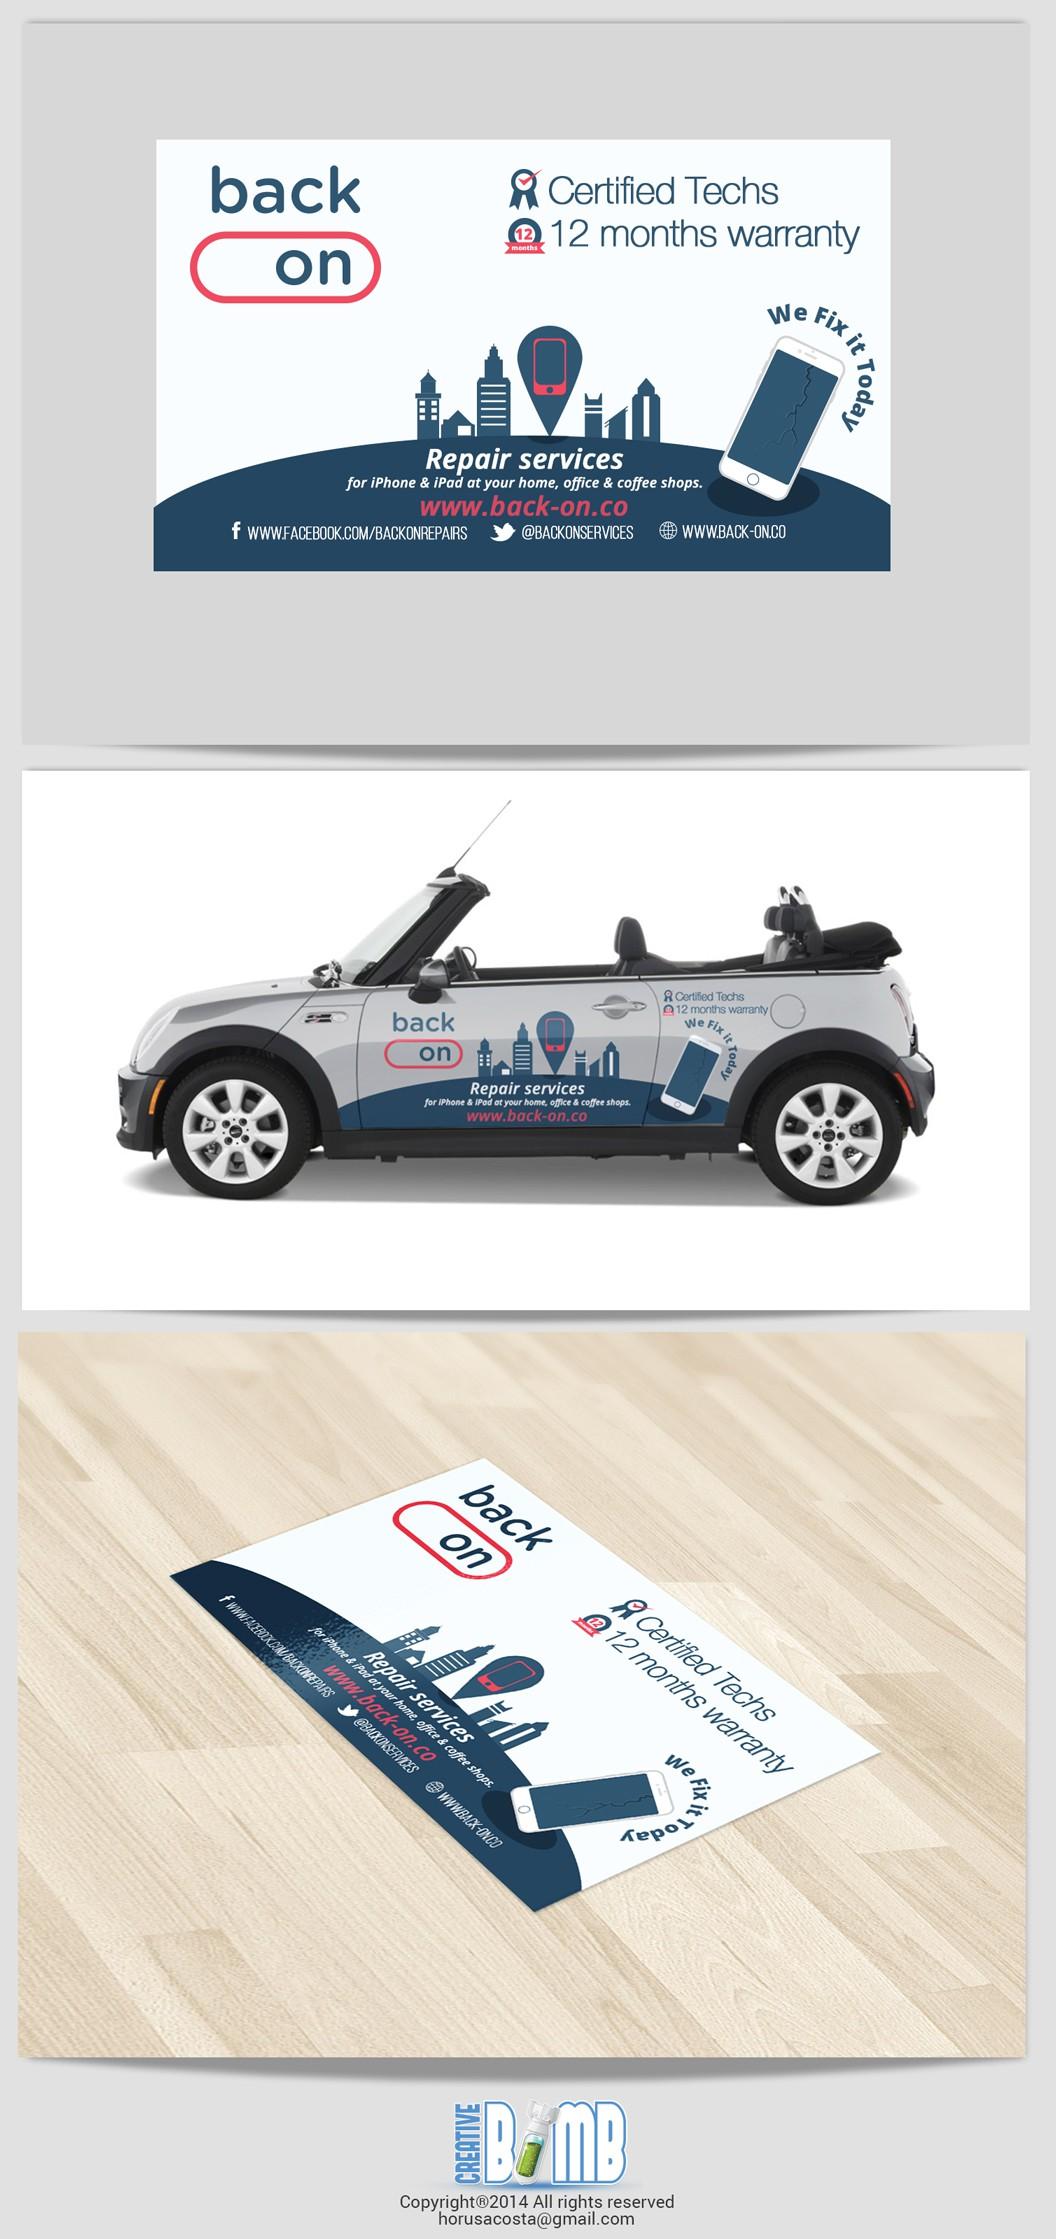 Make a clean killer door car wrap and business card.